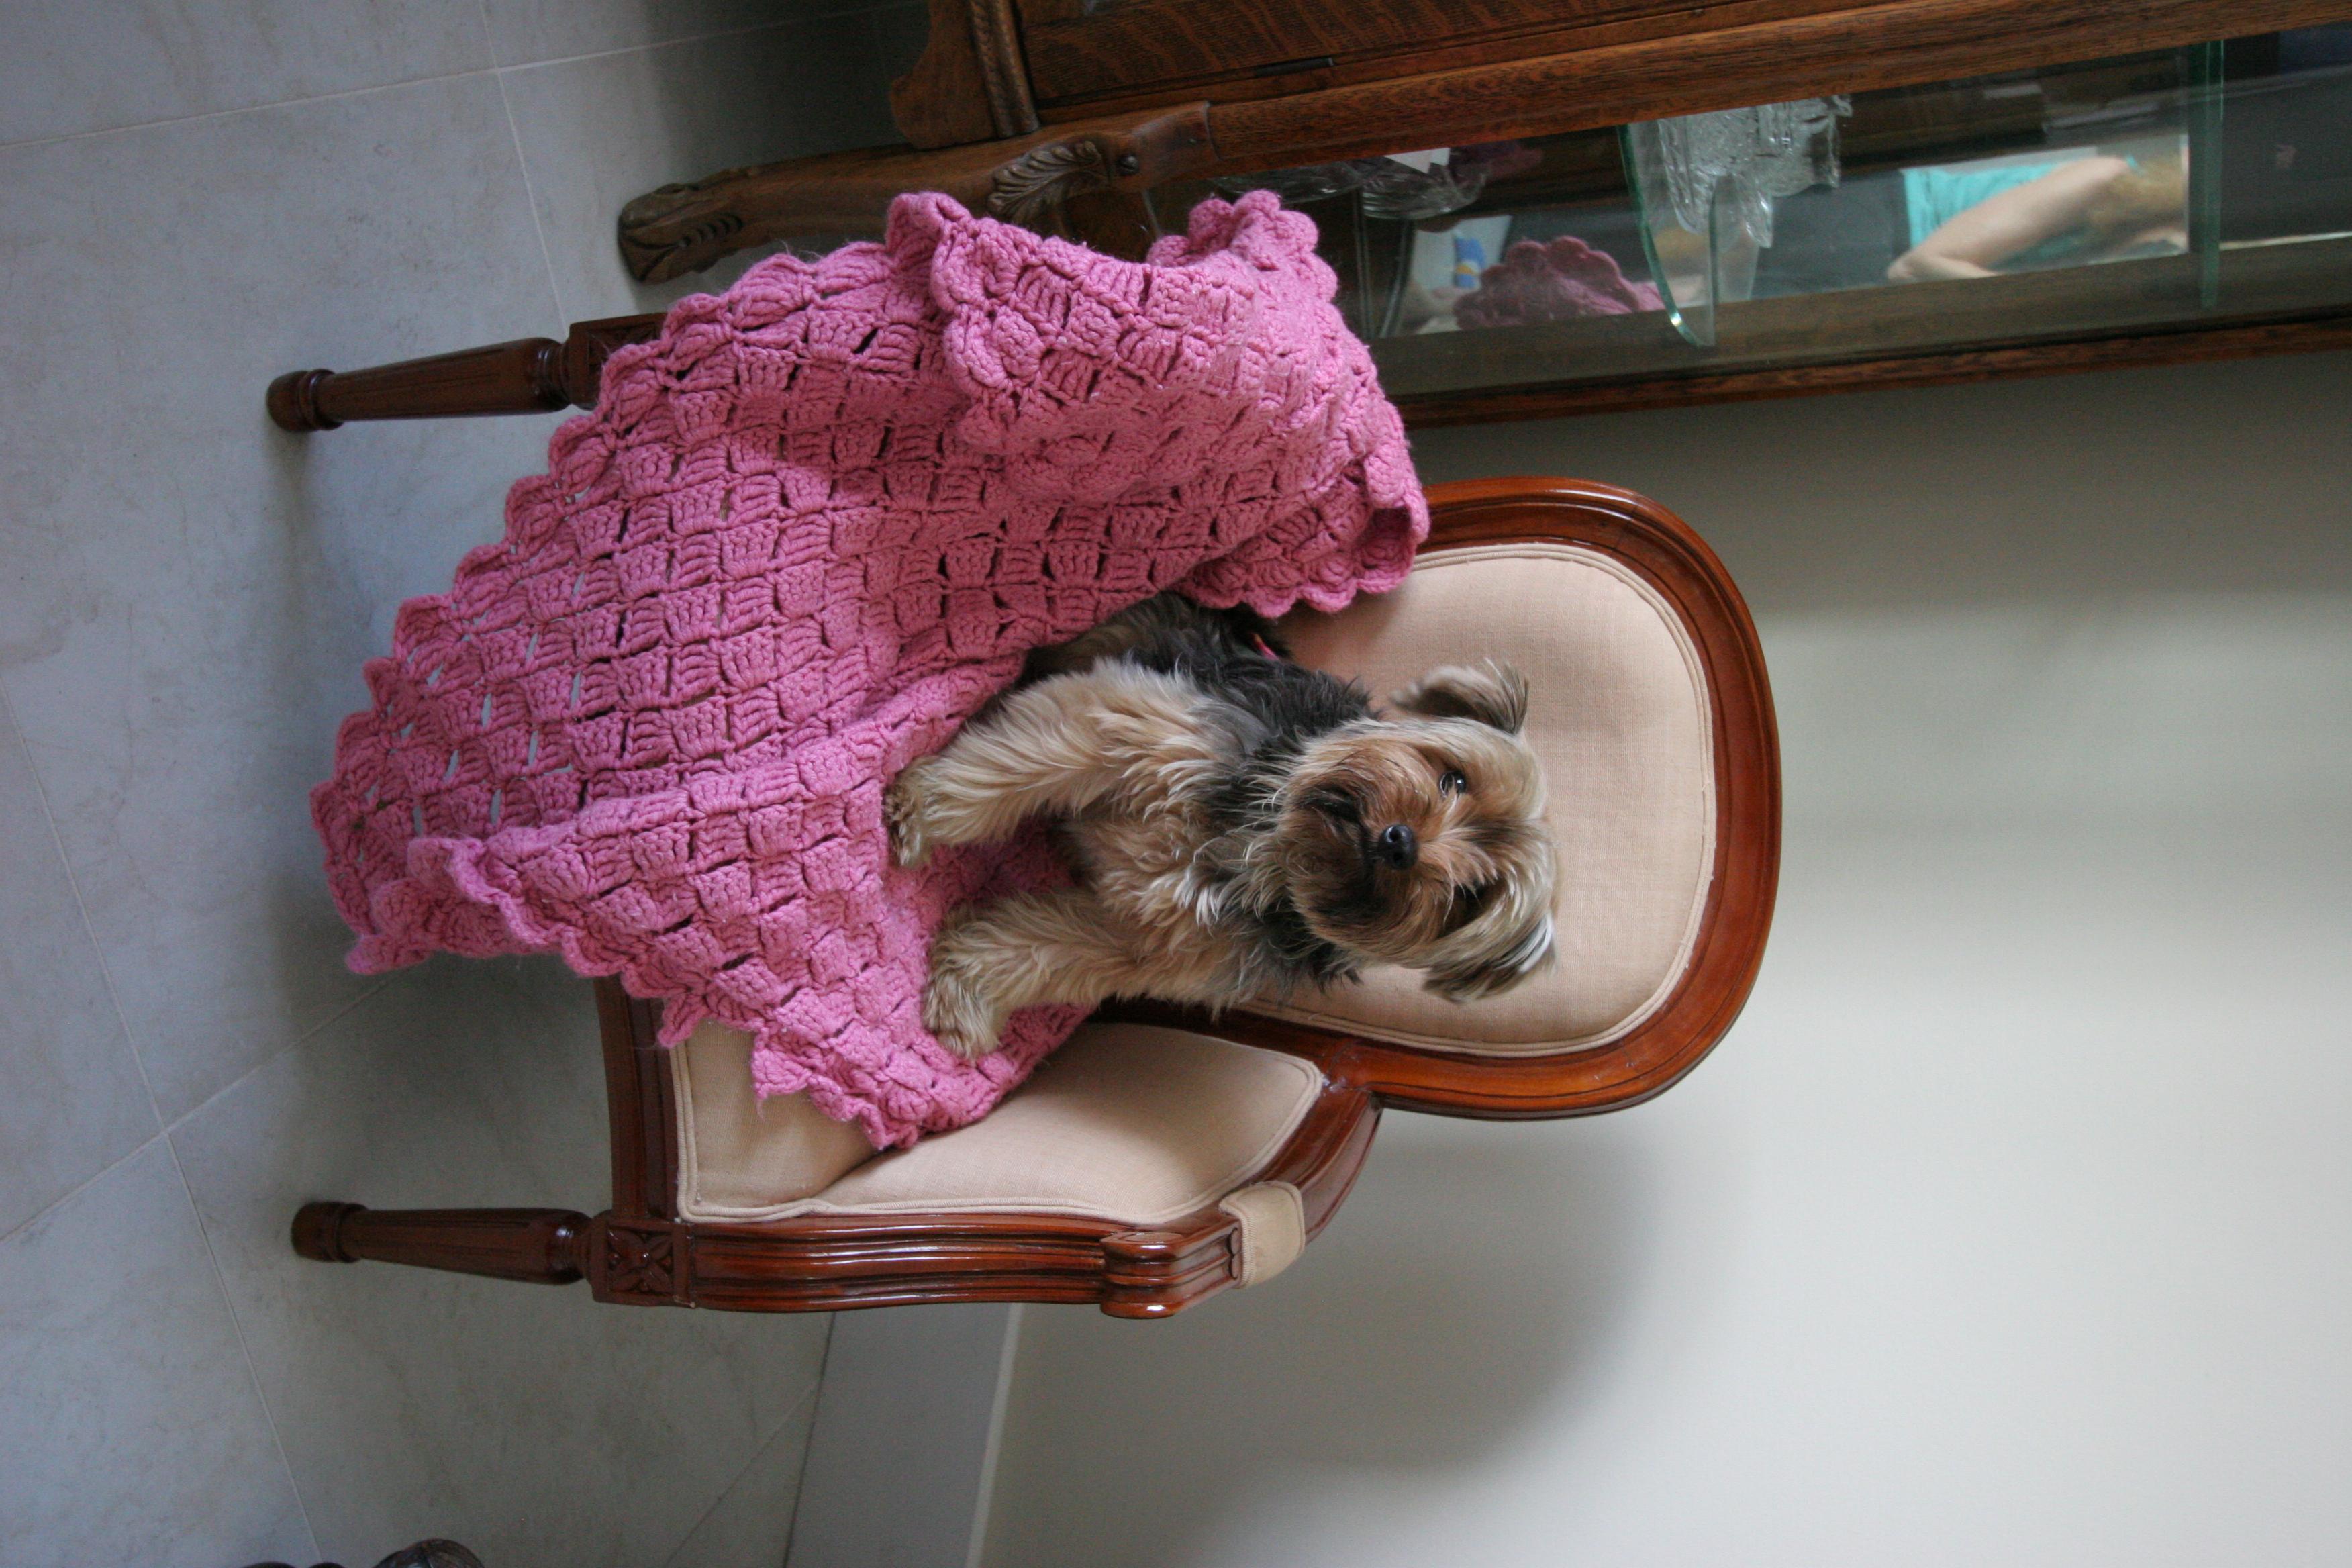 Gallery The Doggie Nanny 1